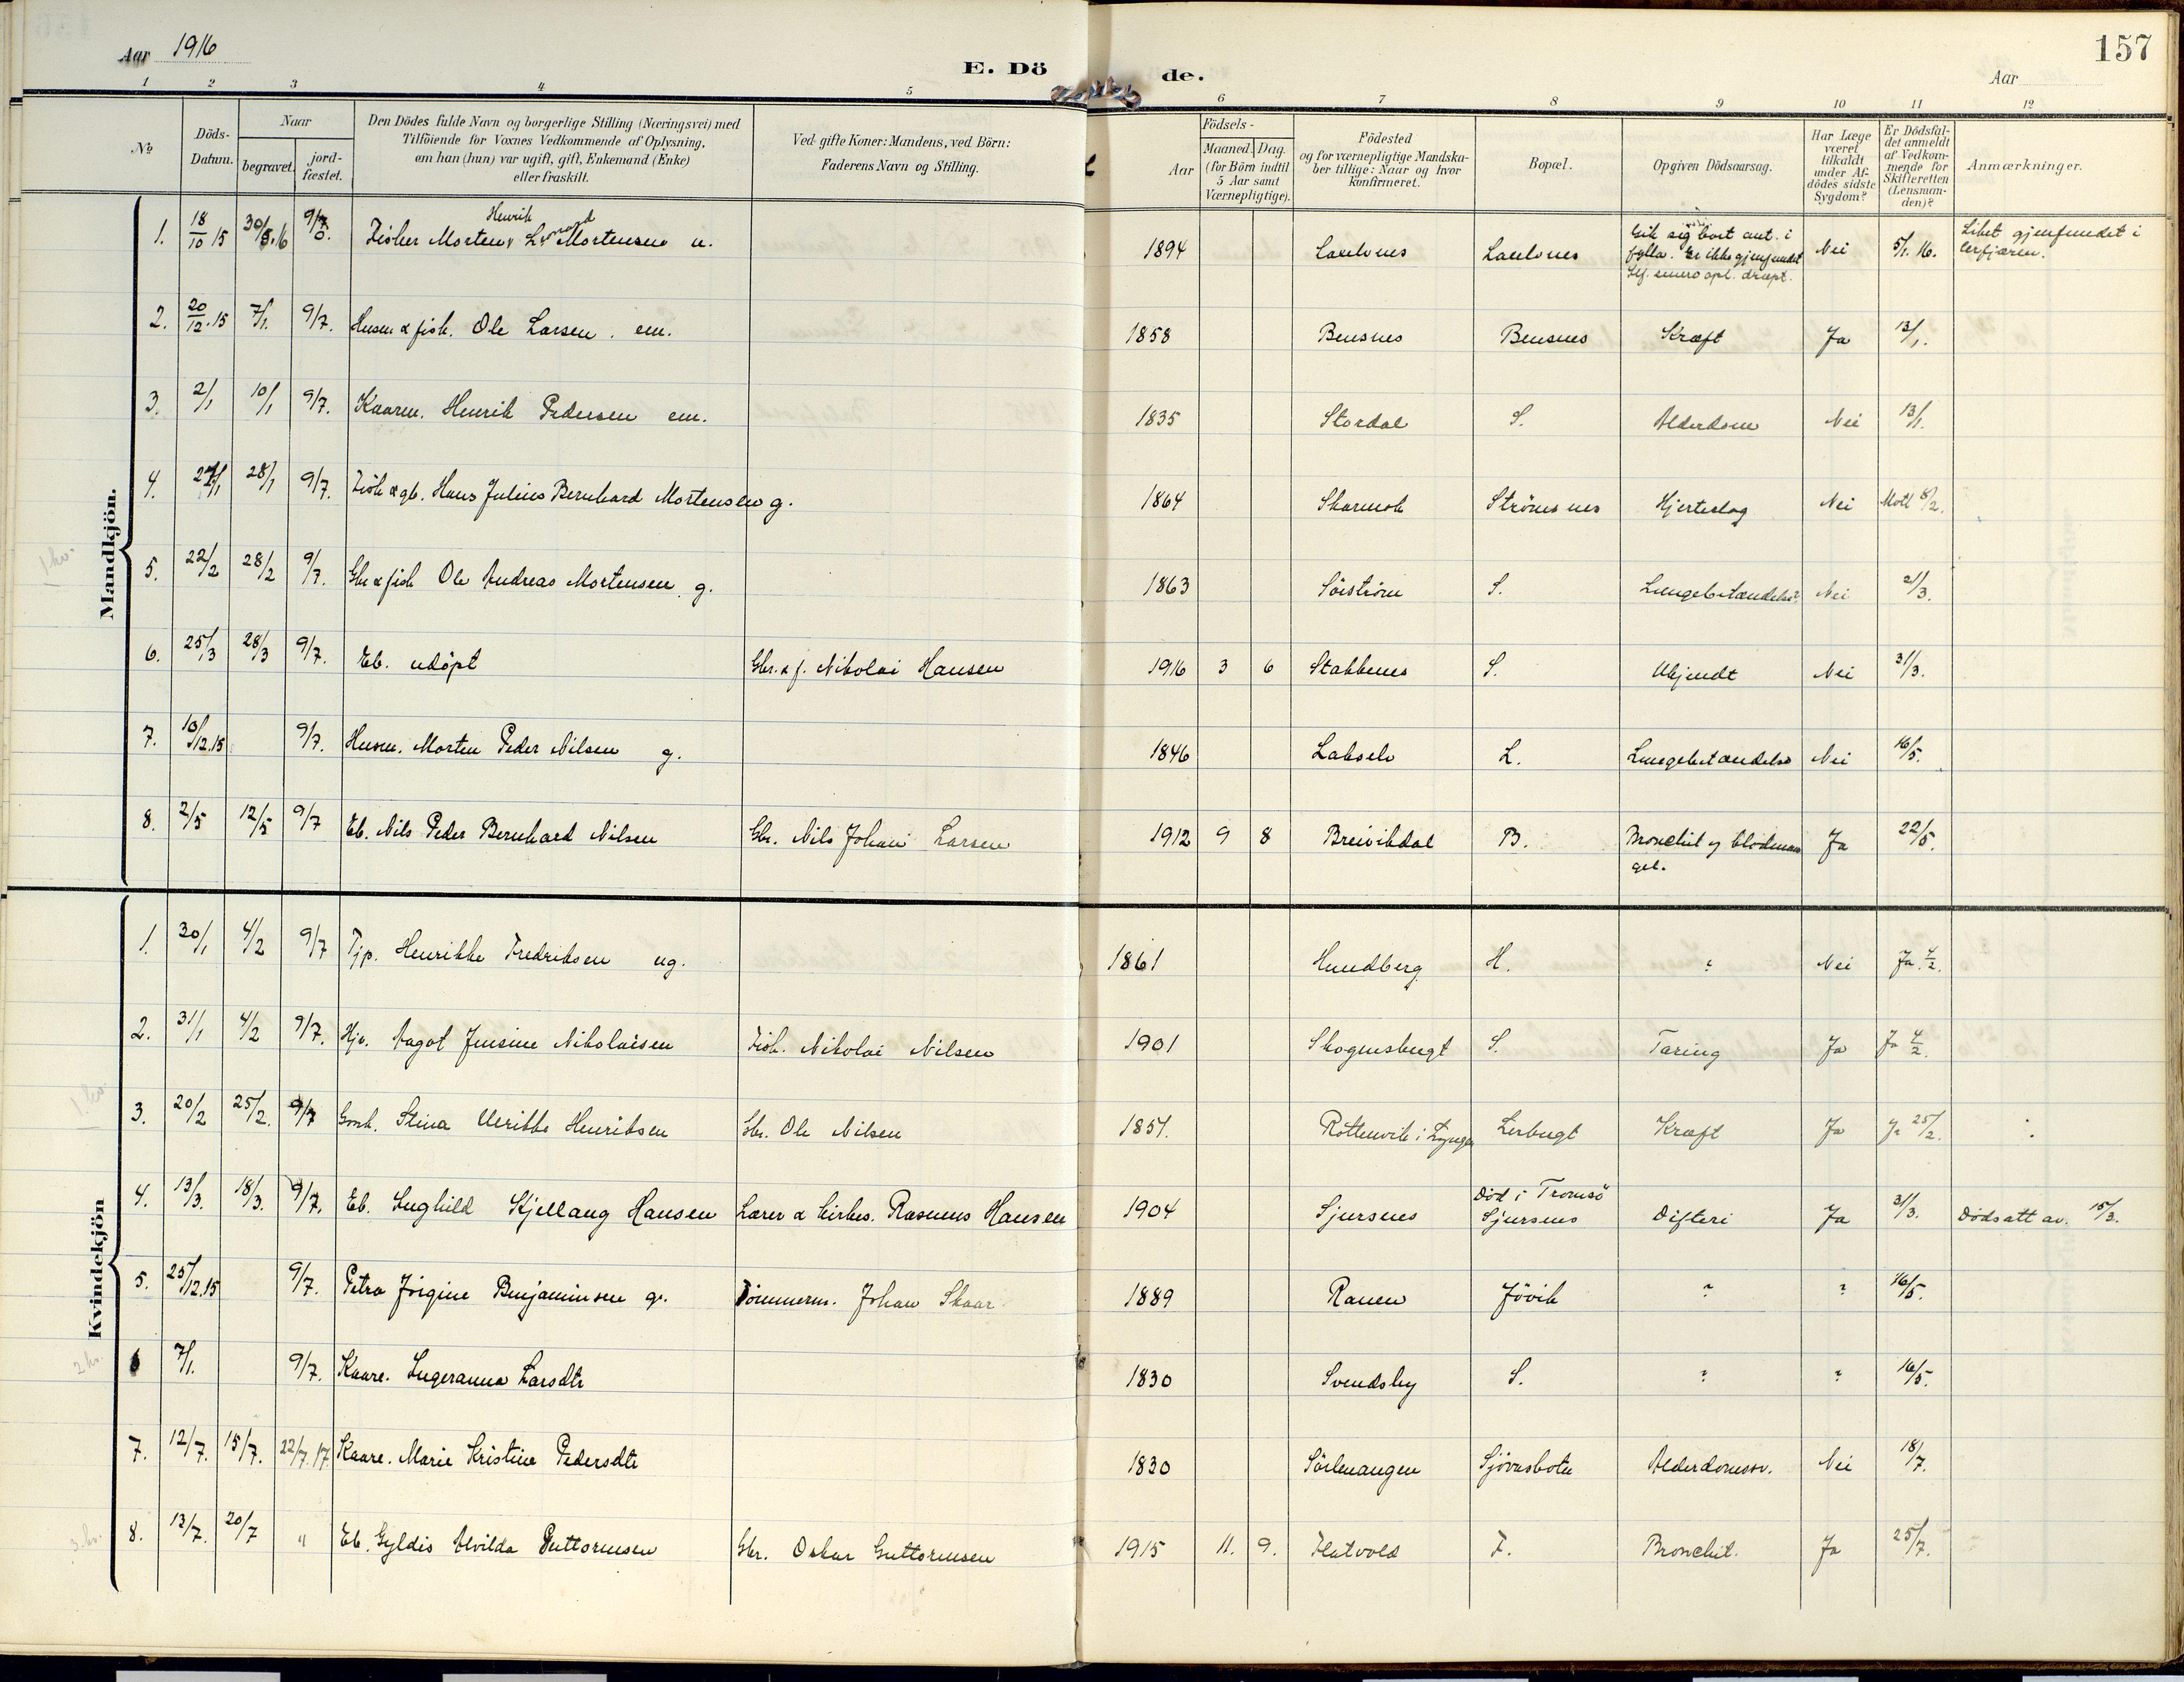 SATØ, Lyngen sokneprestembete, Ministerialbok nr. 14, 1905-1920, s. 157